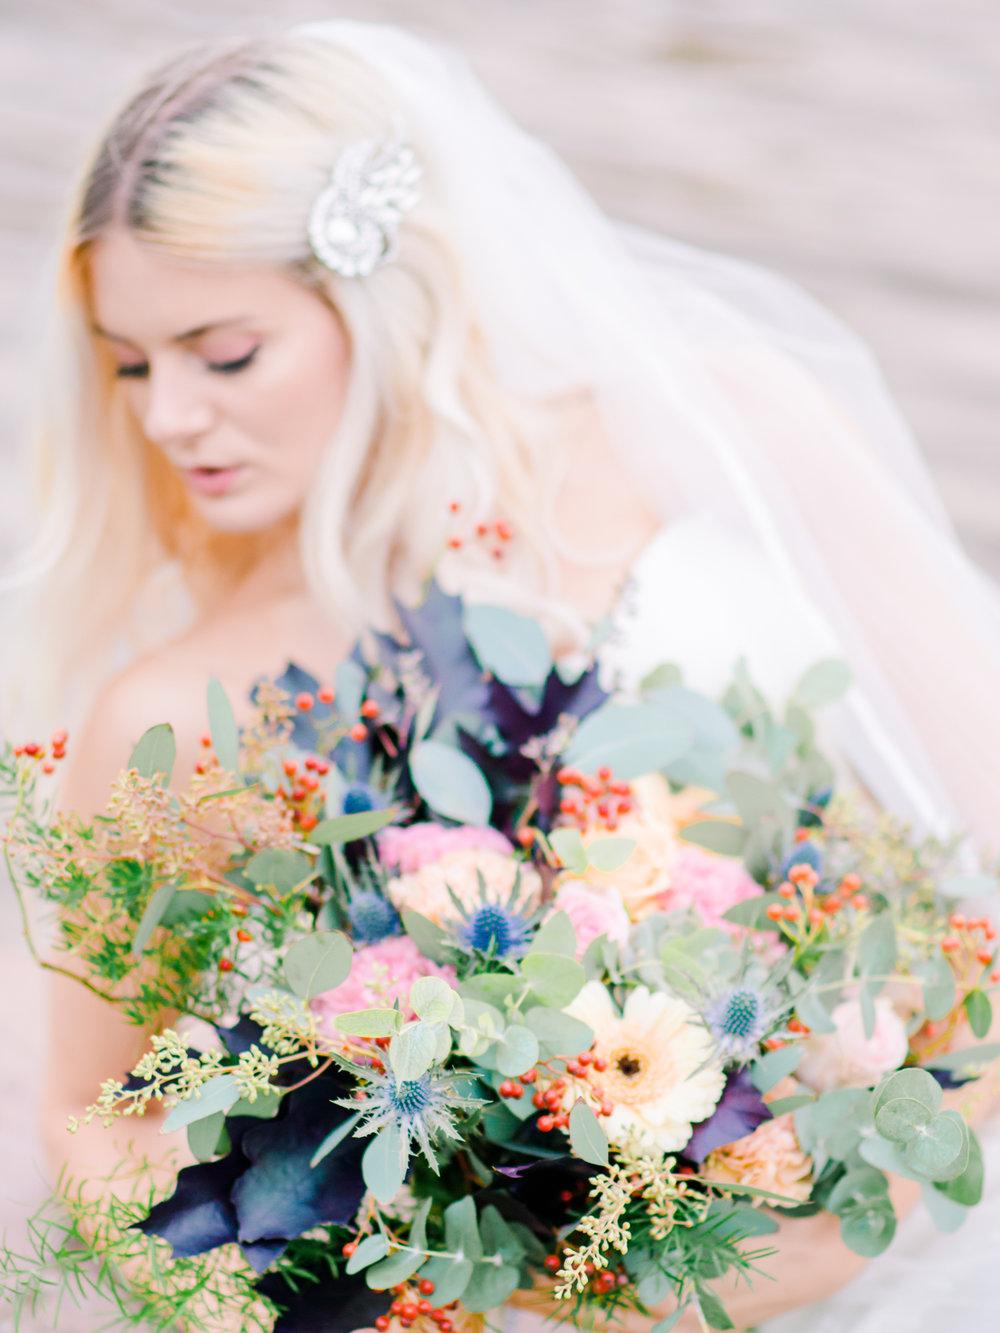 Elegant Organic Fall Swedish Bridal Wedding Styled Shoot - Erika Alvarenga Photography-23.jpg